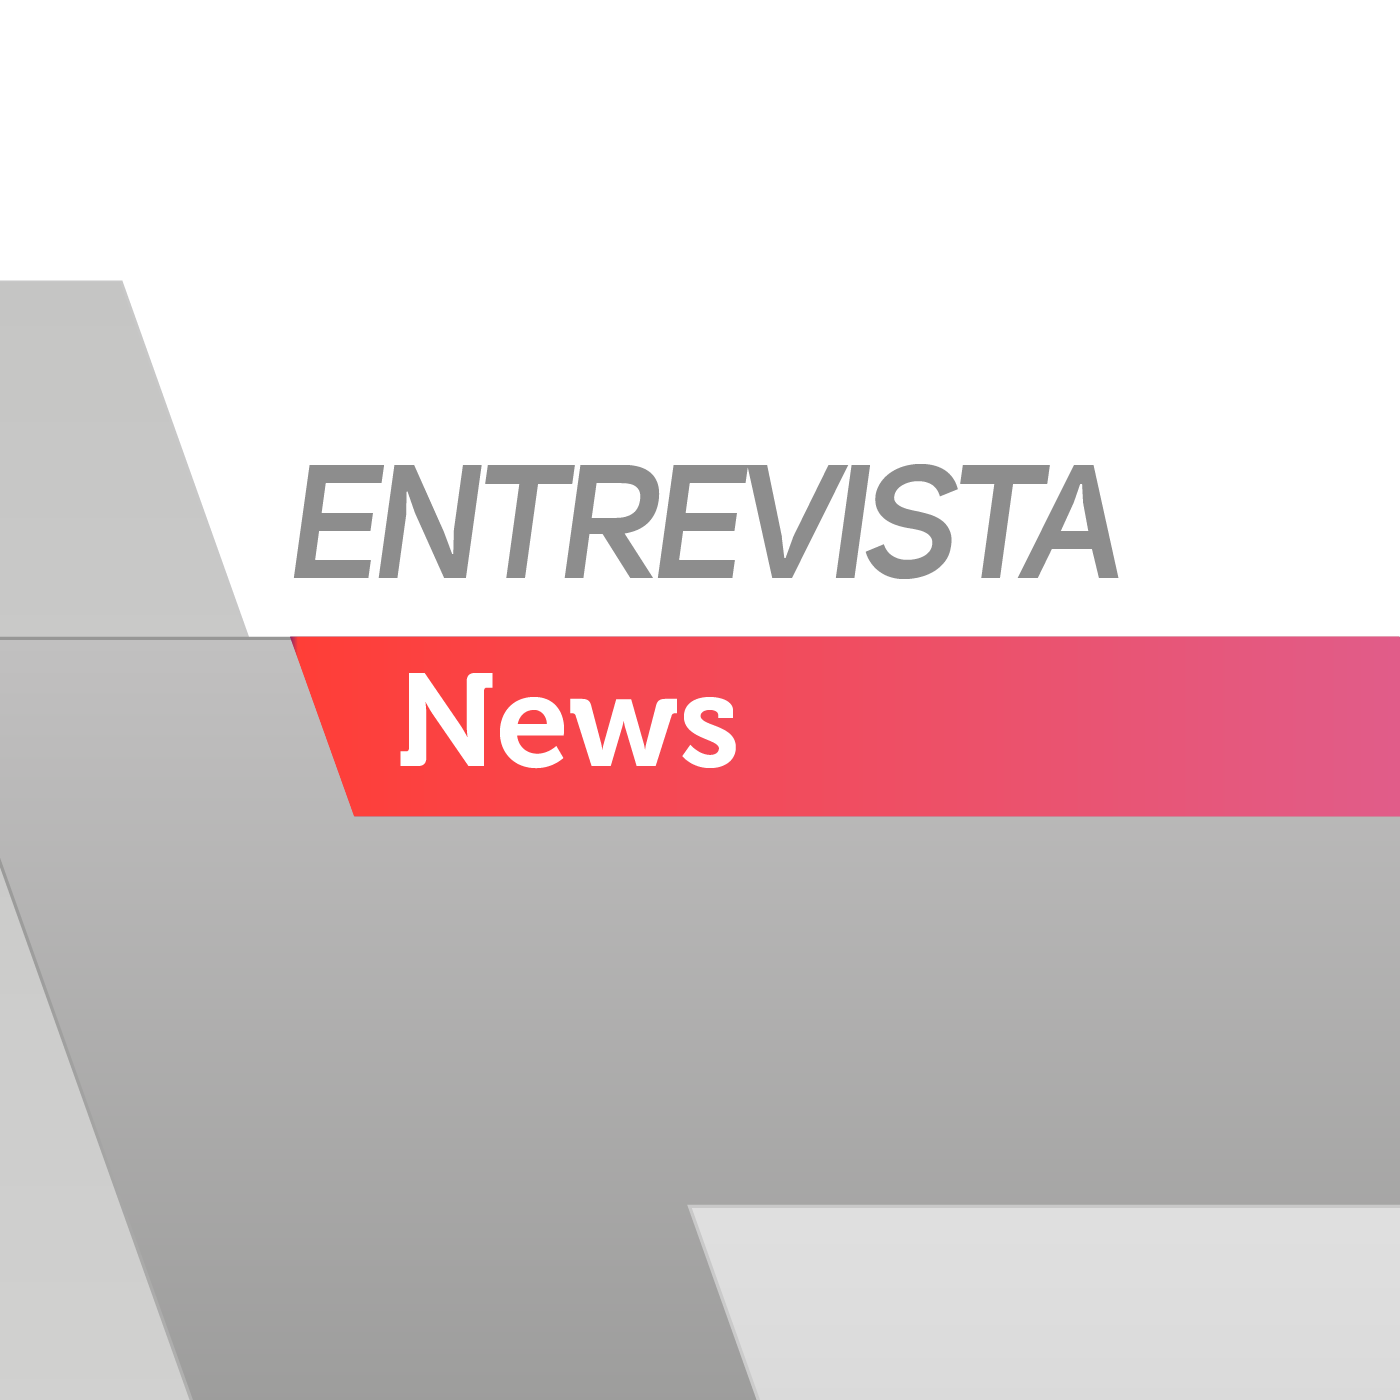 Giane Guerra entrevista Dirnei Antonio Datti, gerente geral América Latina da Danfoss Power